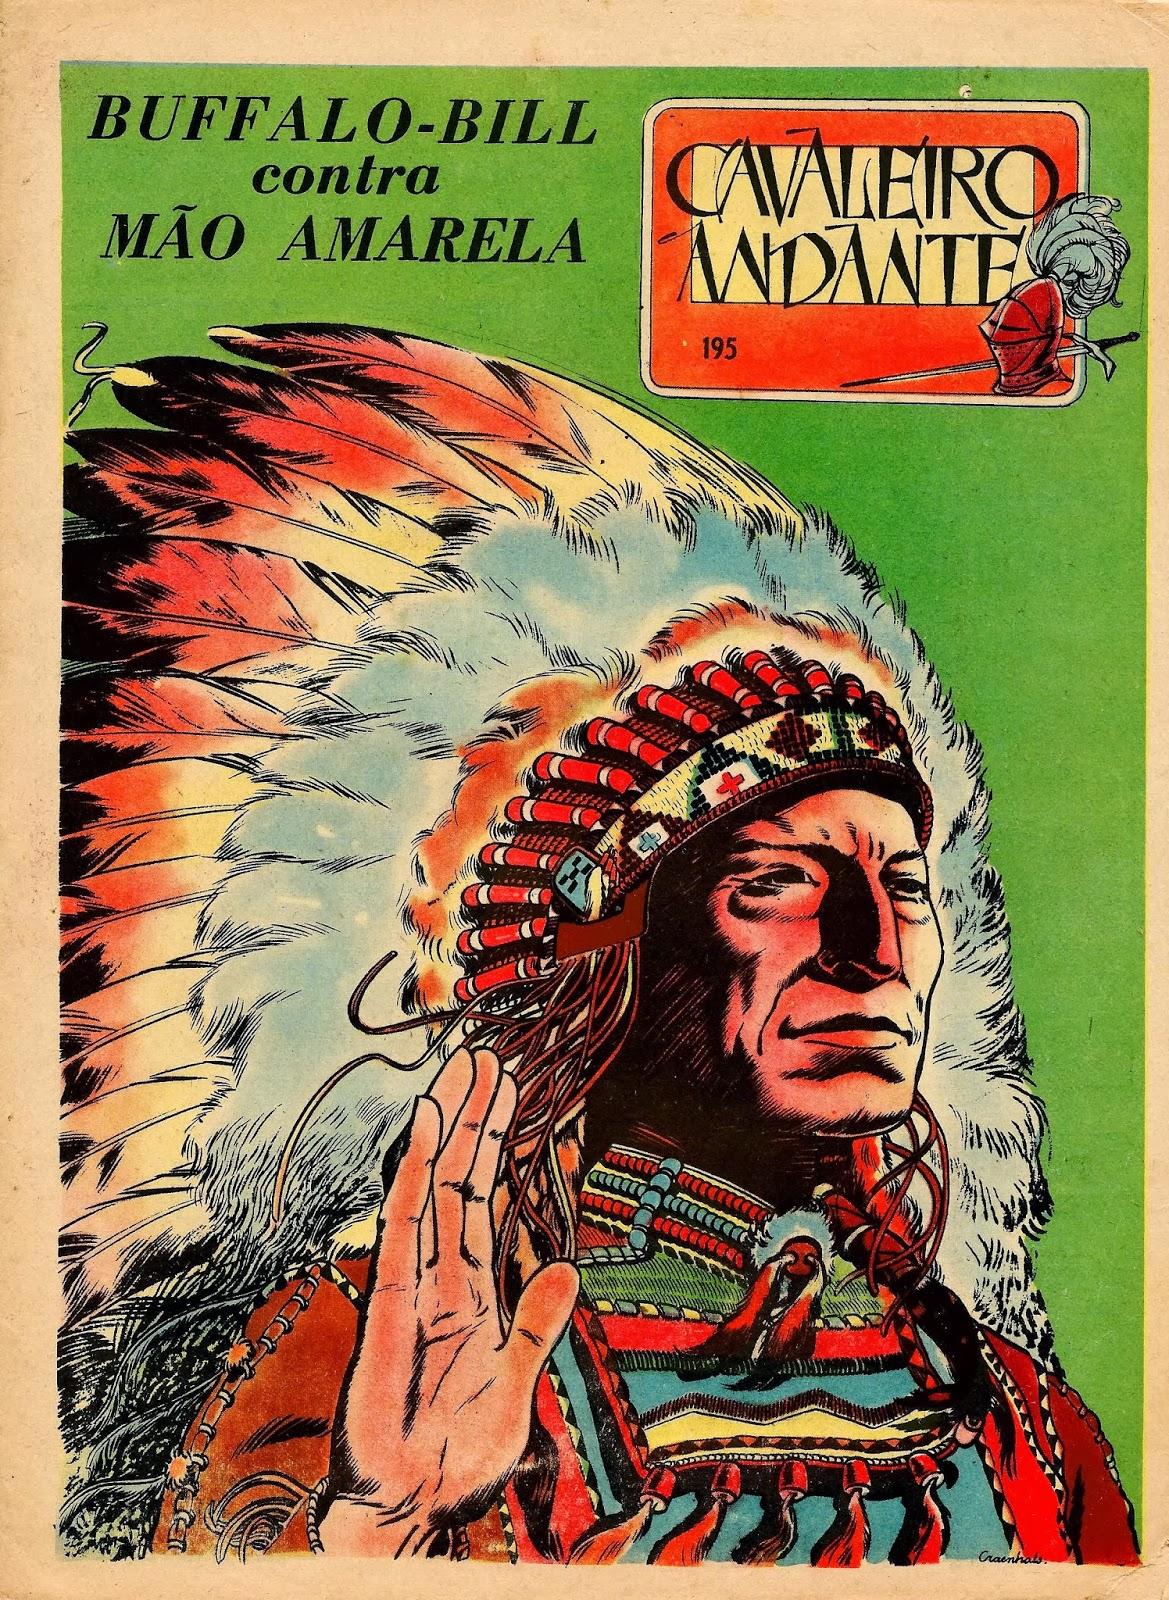 https://passagens-bd.blogspot.pt/2014/03/bd0063-buffalo-bill-contra-mao-amarela.html